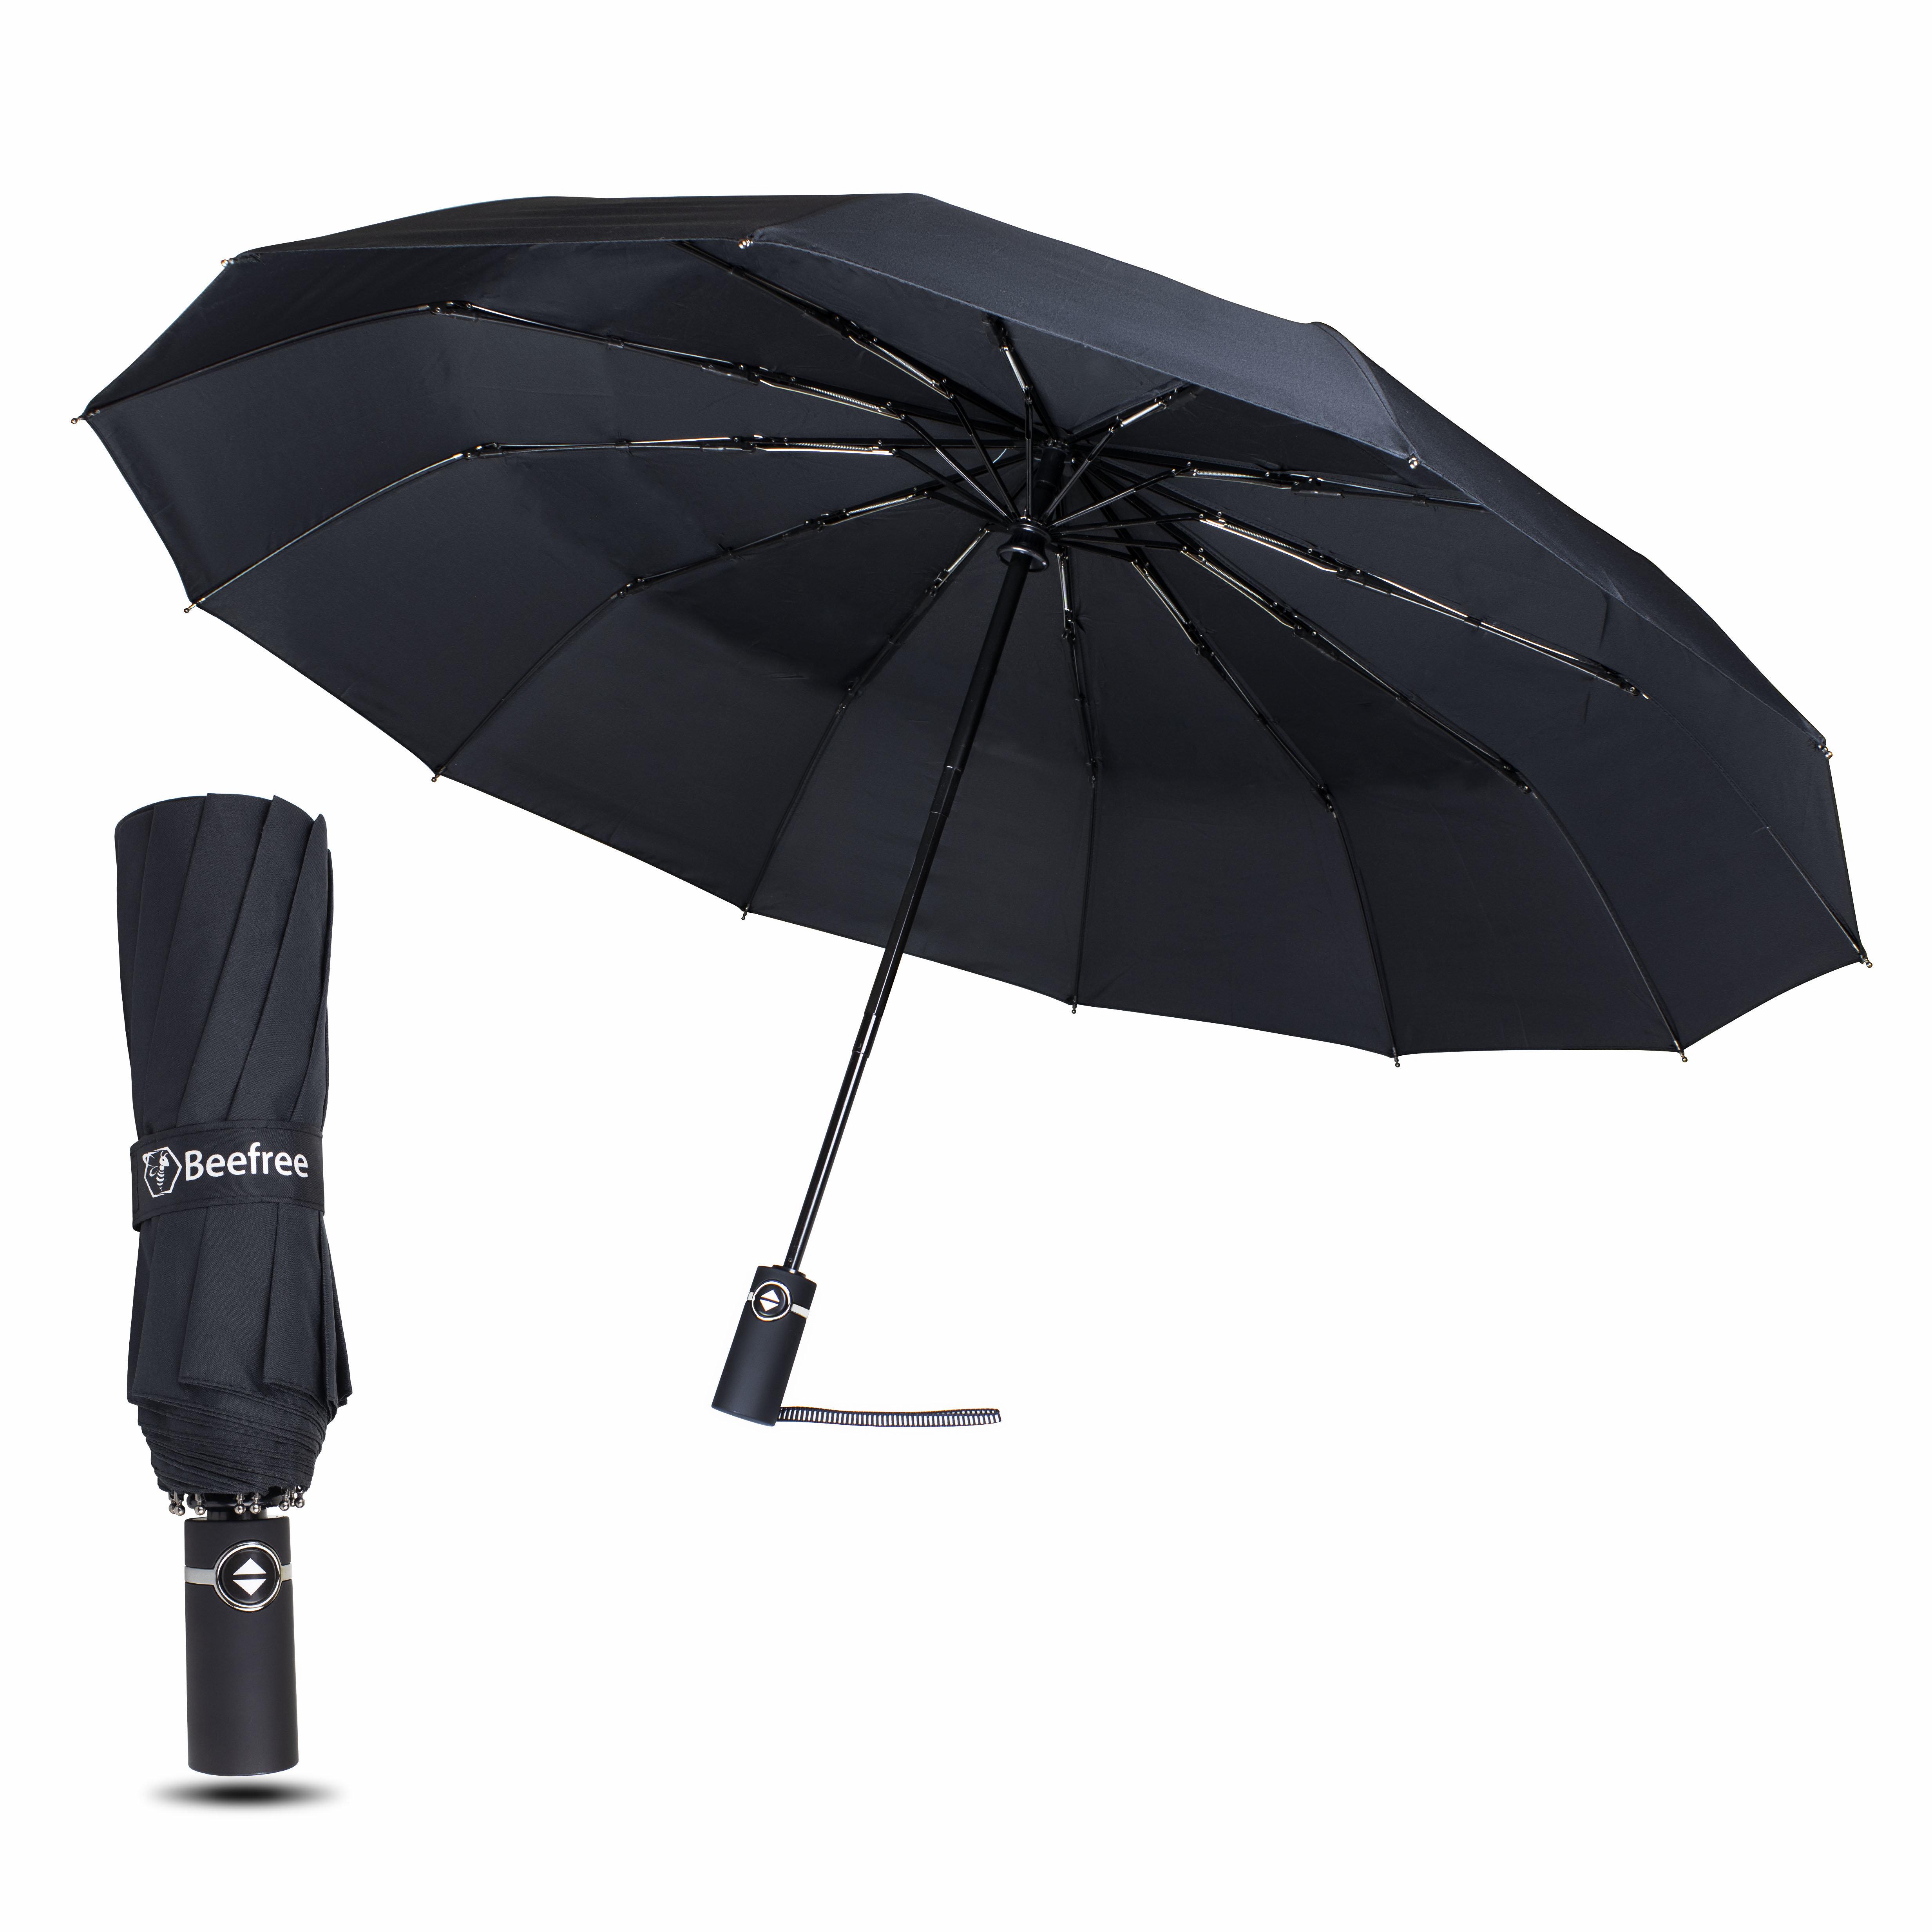 Beefree Stormparaplu Ø 105 cm | 12 Panelen - Zwart